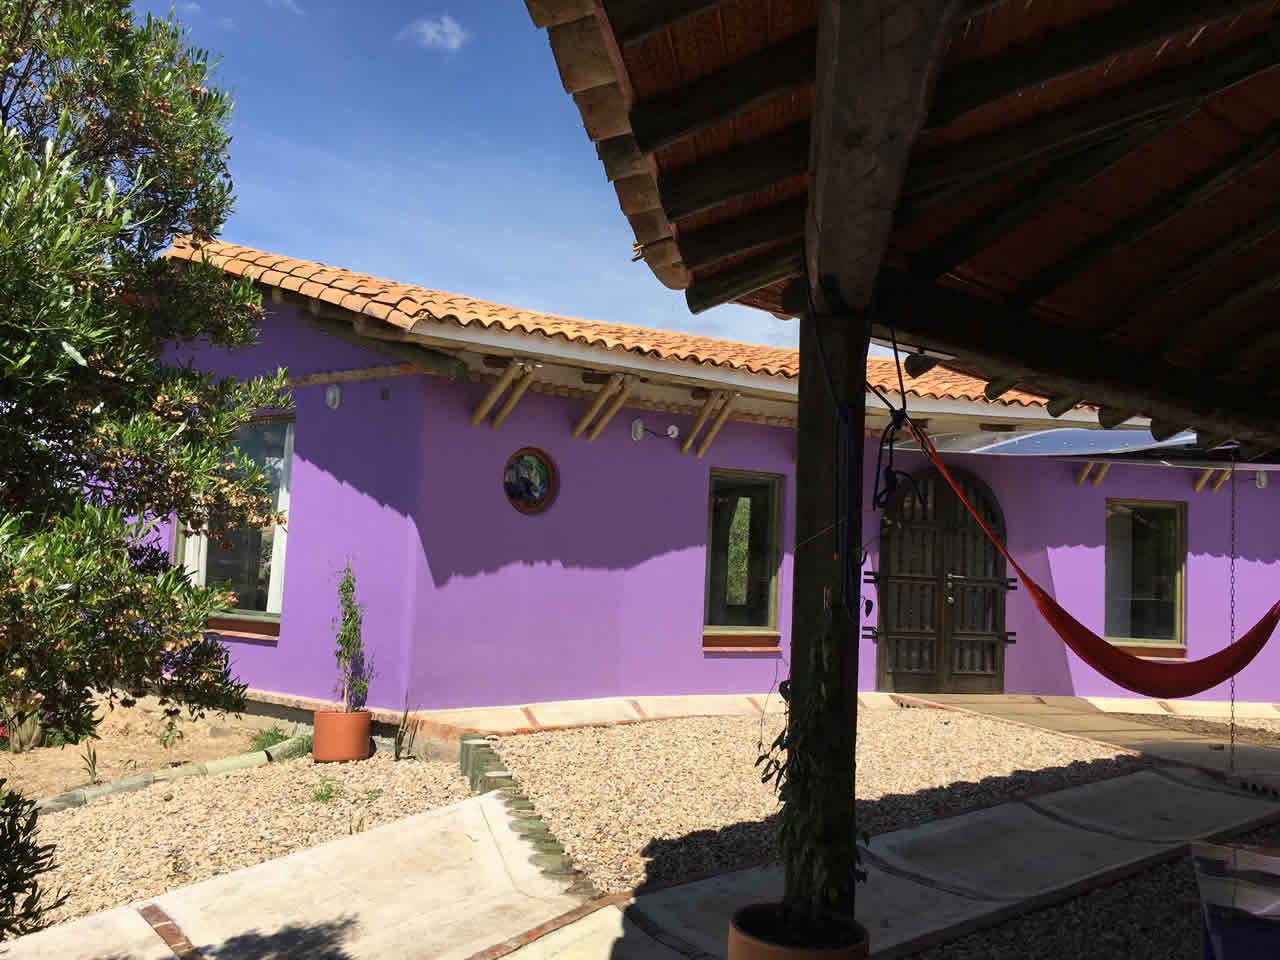 Alquiler casa Jishana Villa de Leyva - Exteriores